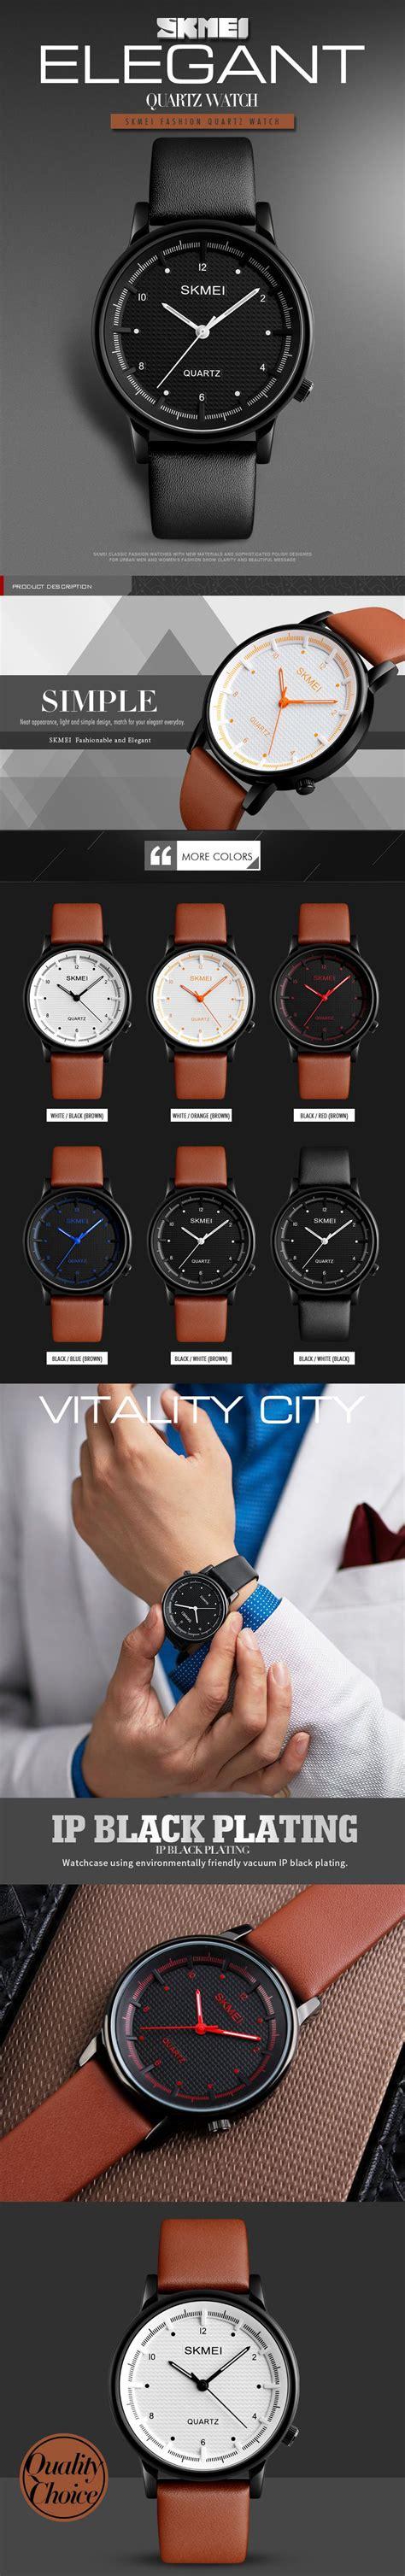 Skmei Fashion Casual Leather 1083 Murah skmei 1210 fashion simple style leather casual unisex quartz analog wrist at